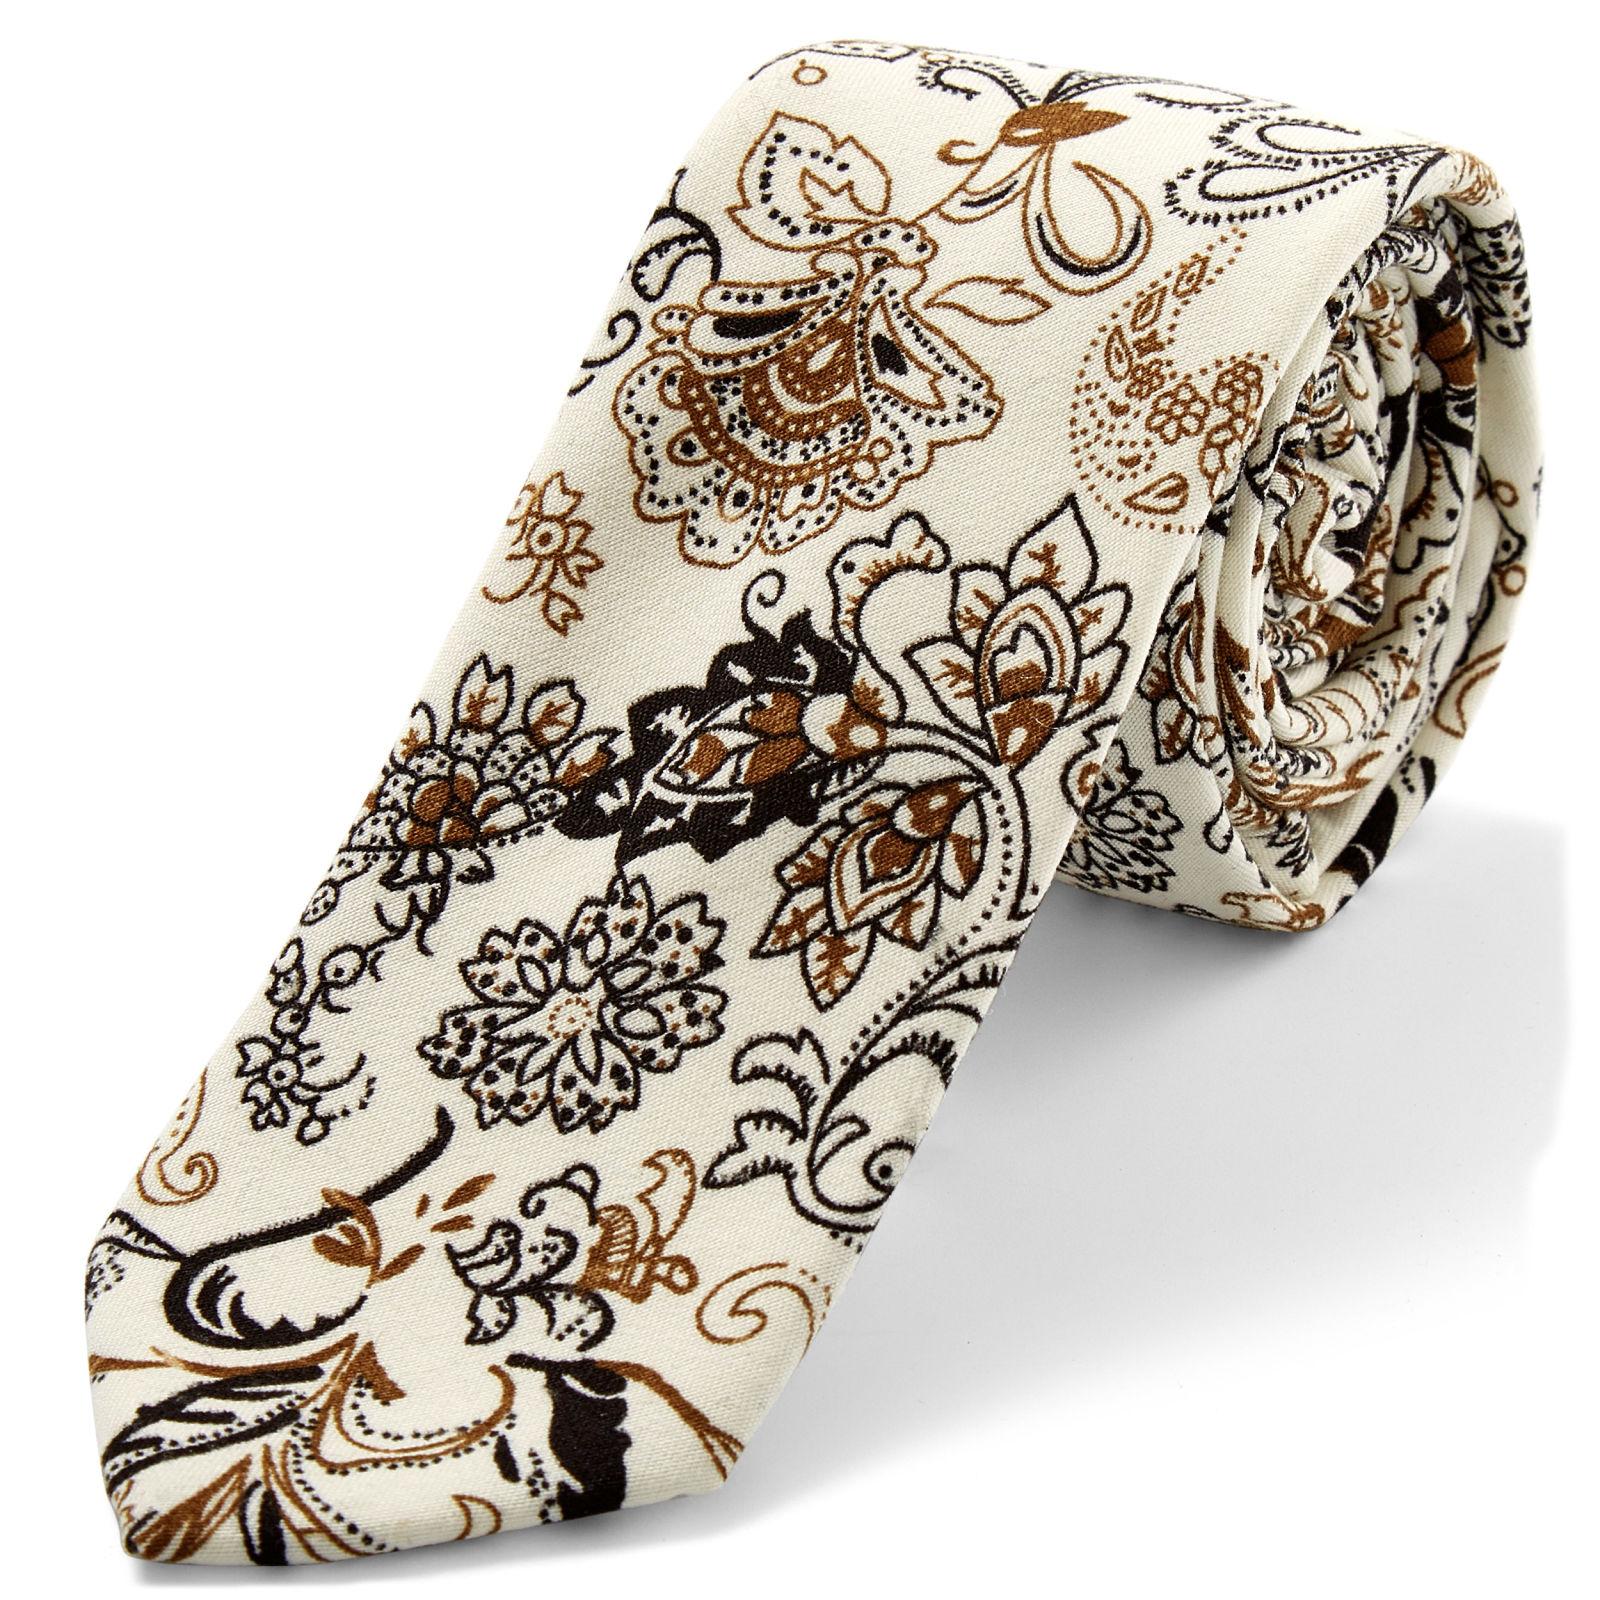 41fea5f11c6 Bílá kravata se vzorem